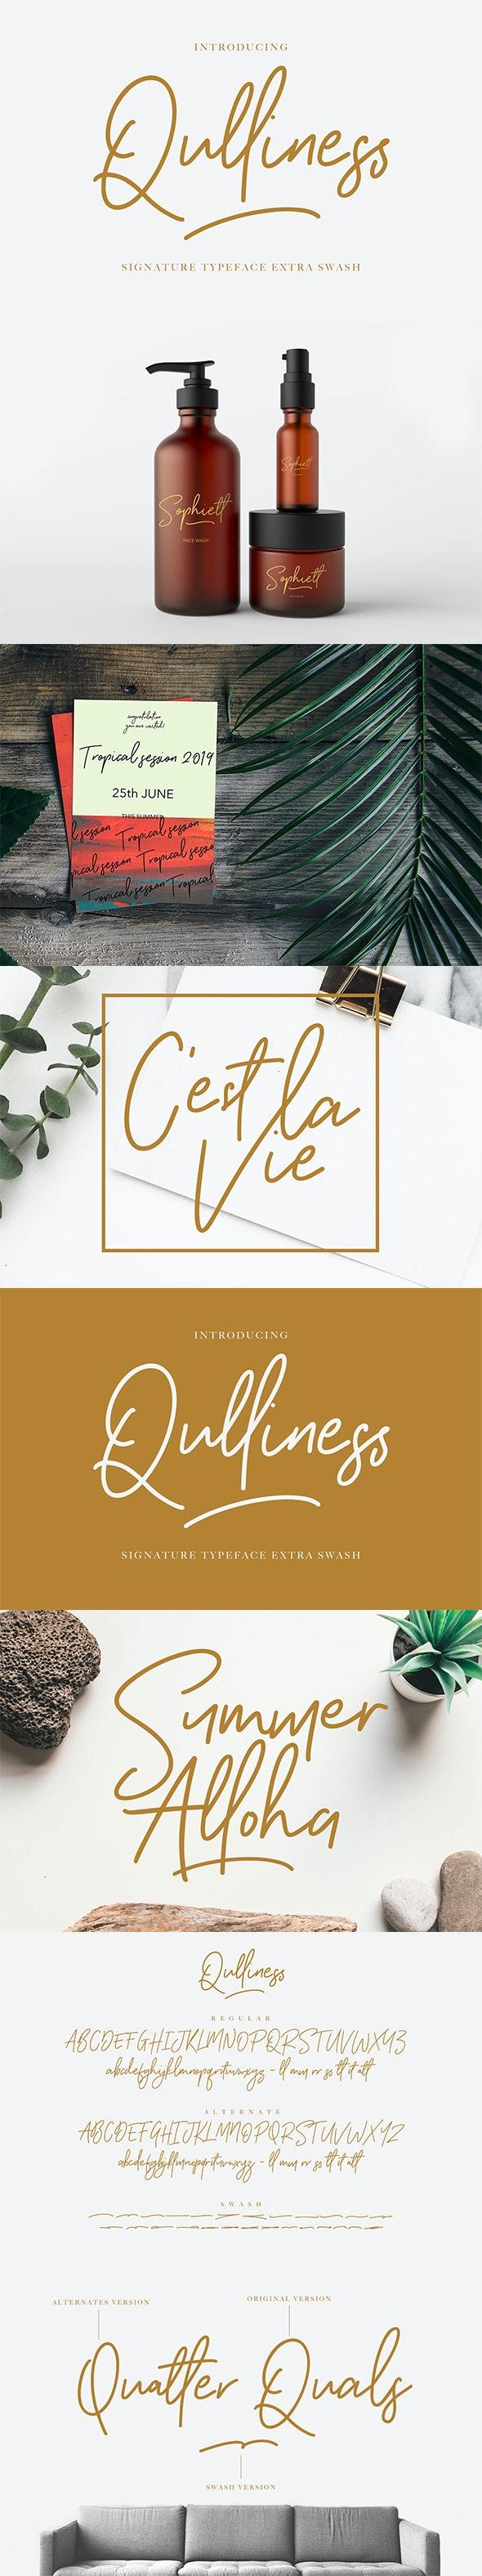 Qulliness Signature Font - Calligraphy Script